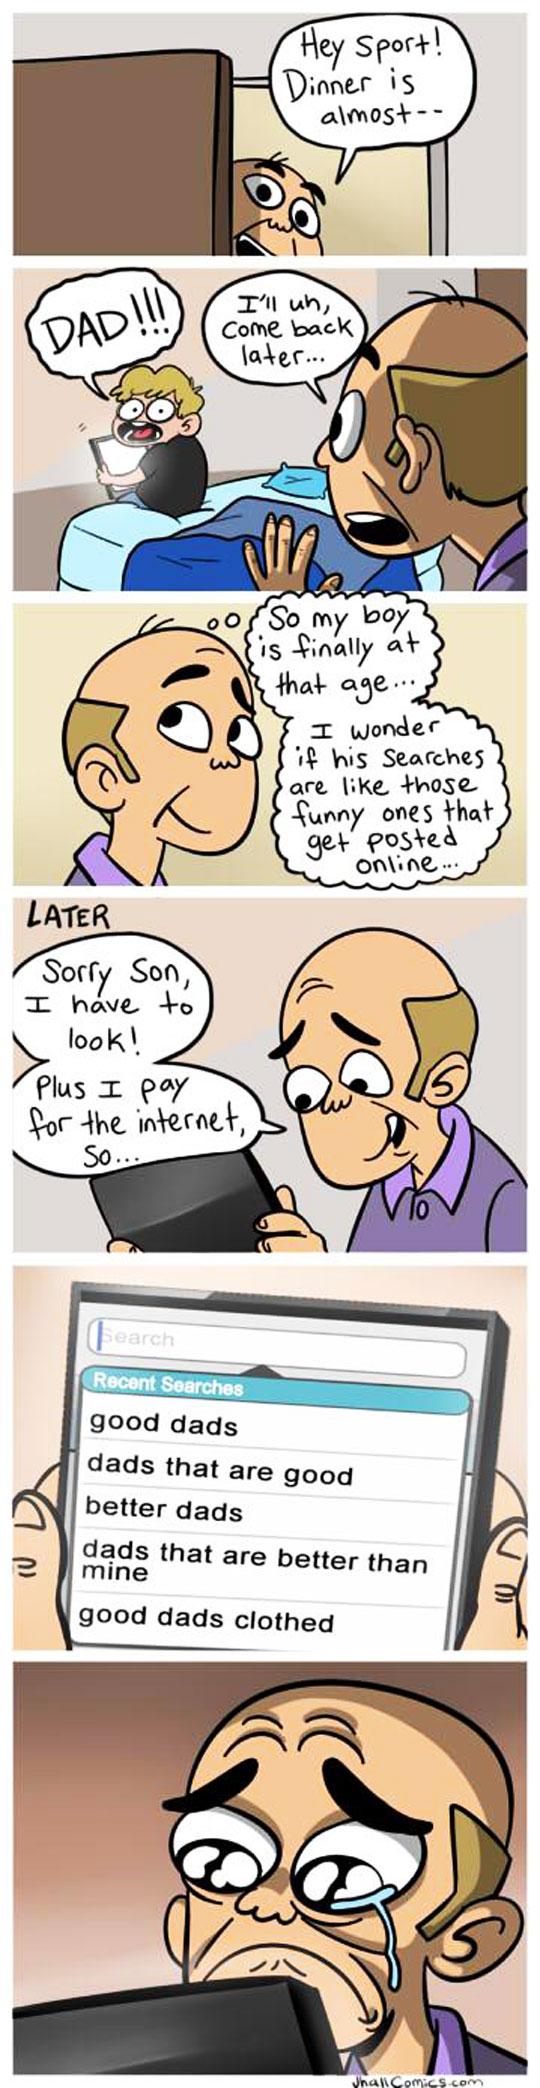 funny-webcomic-dad-son-iPad